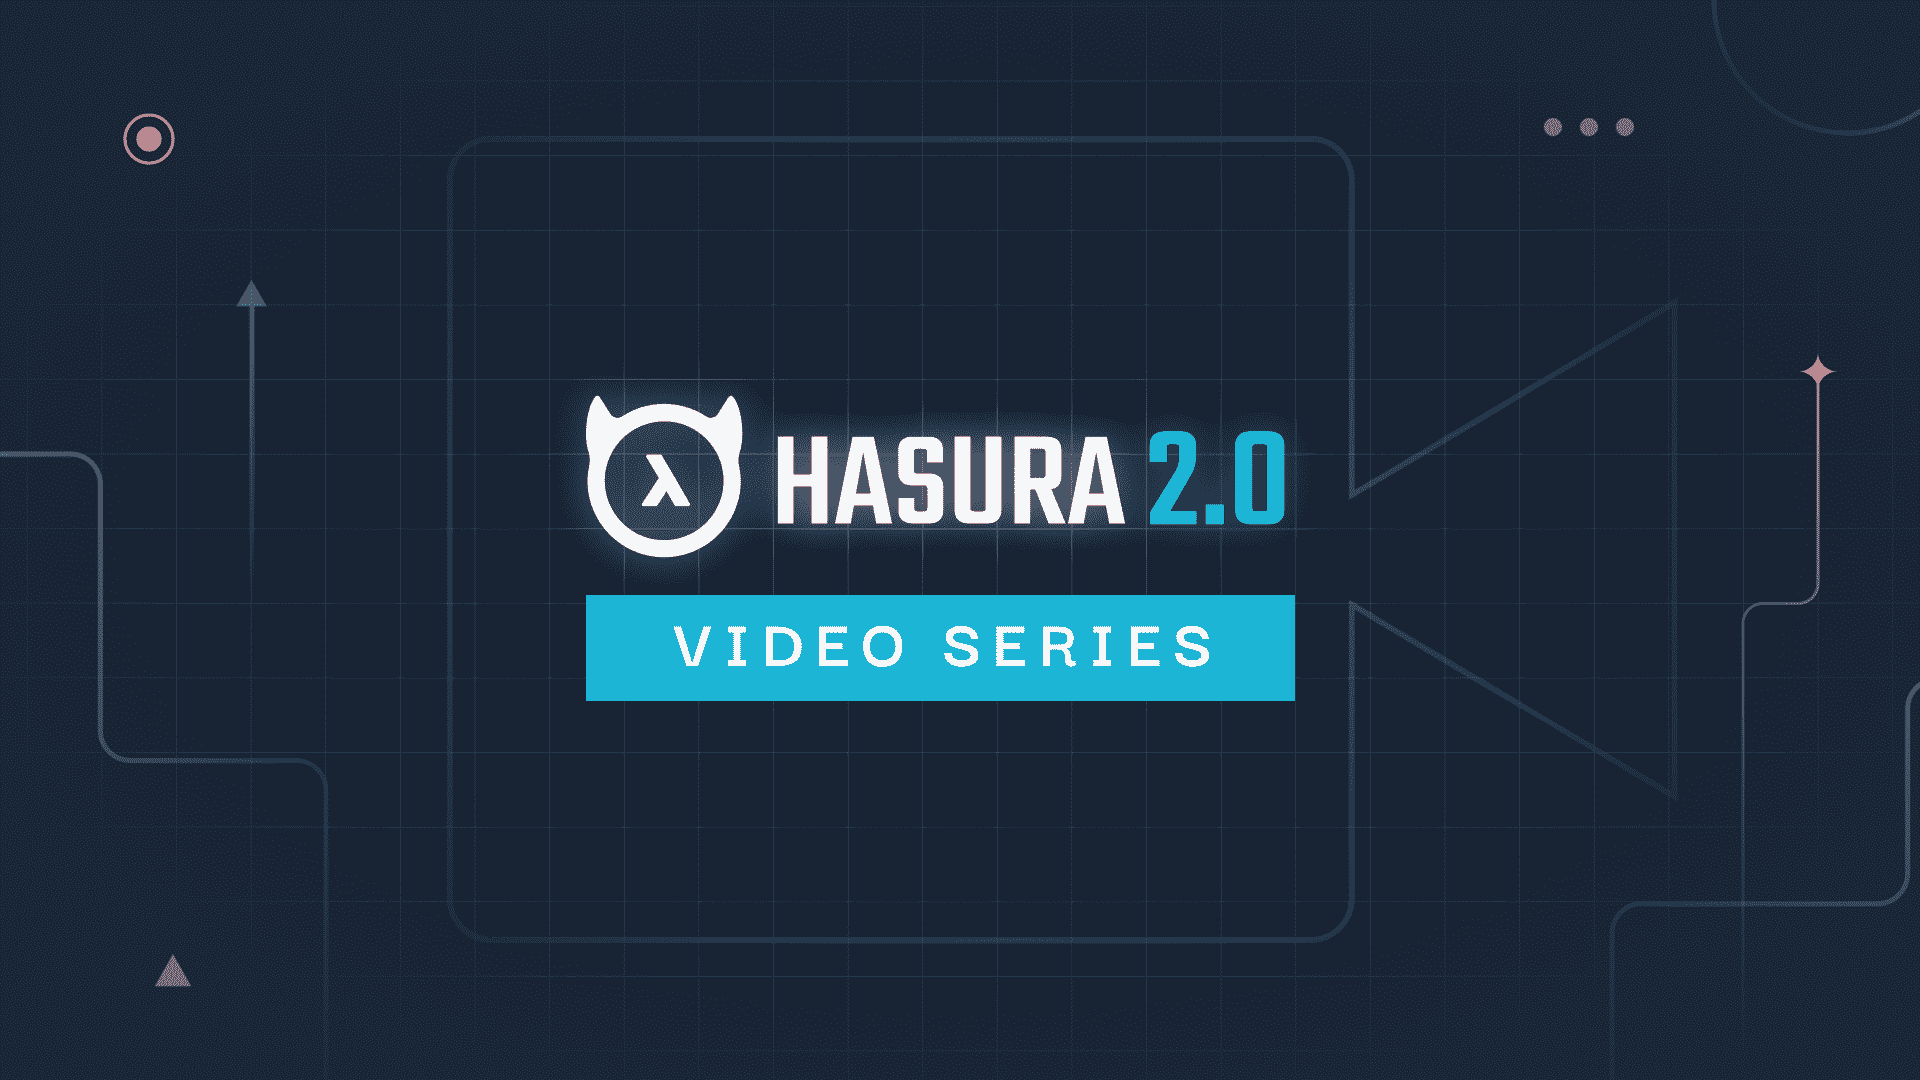 Hasura 2.0 Video Series